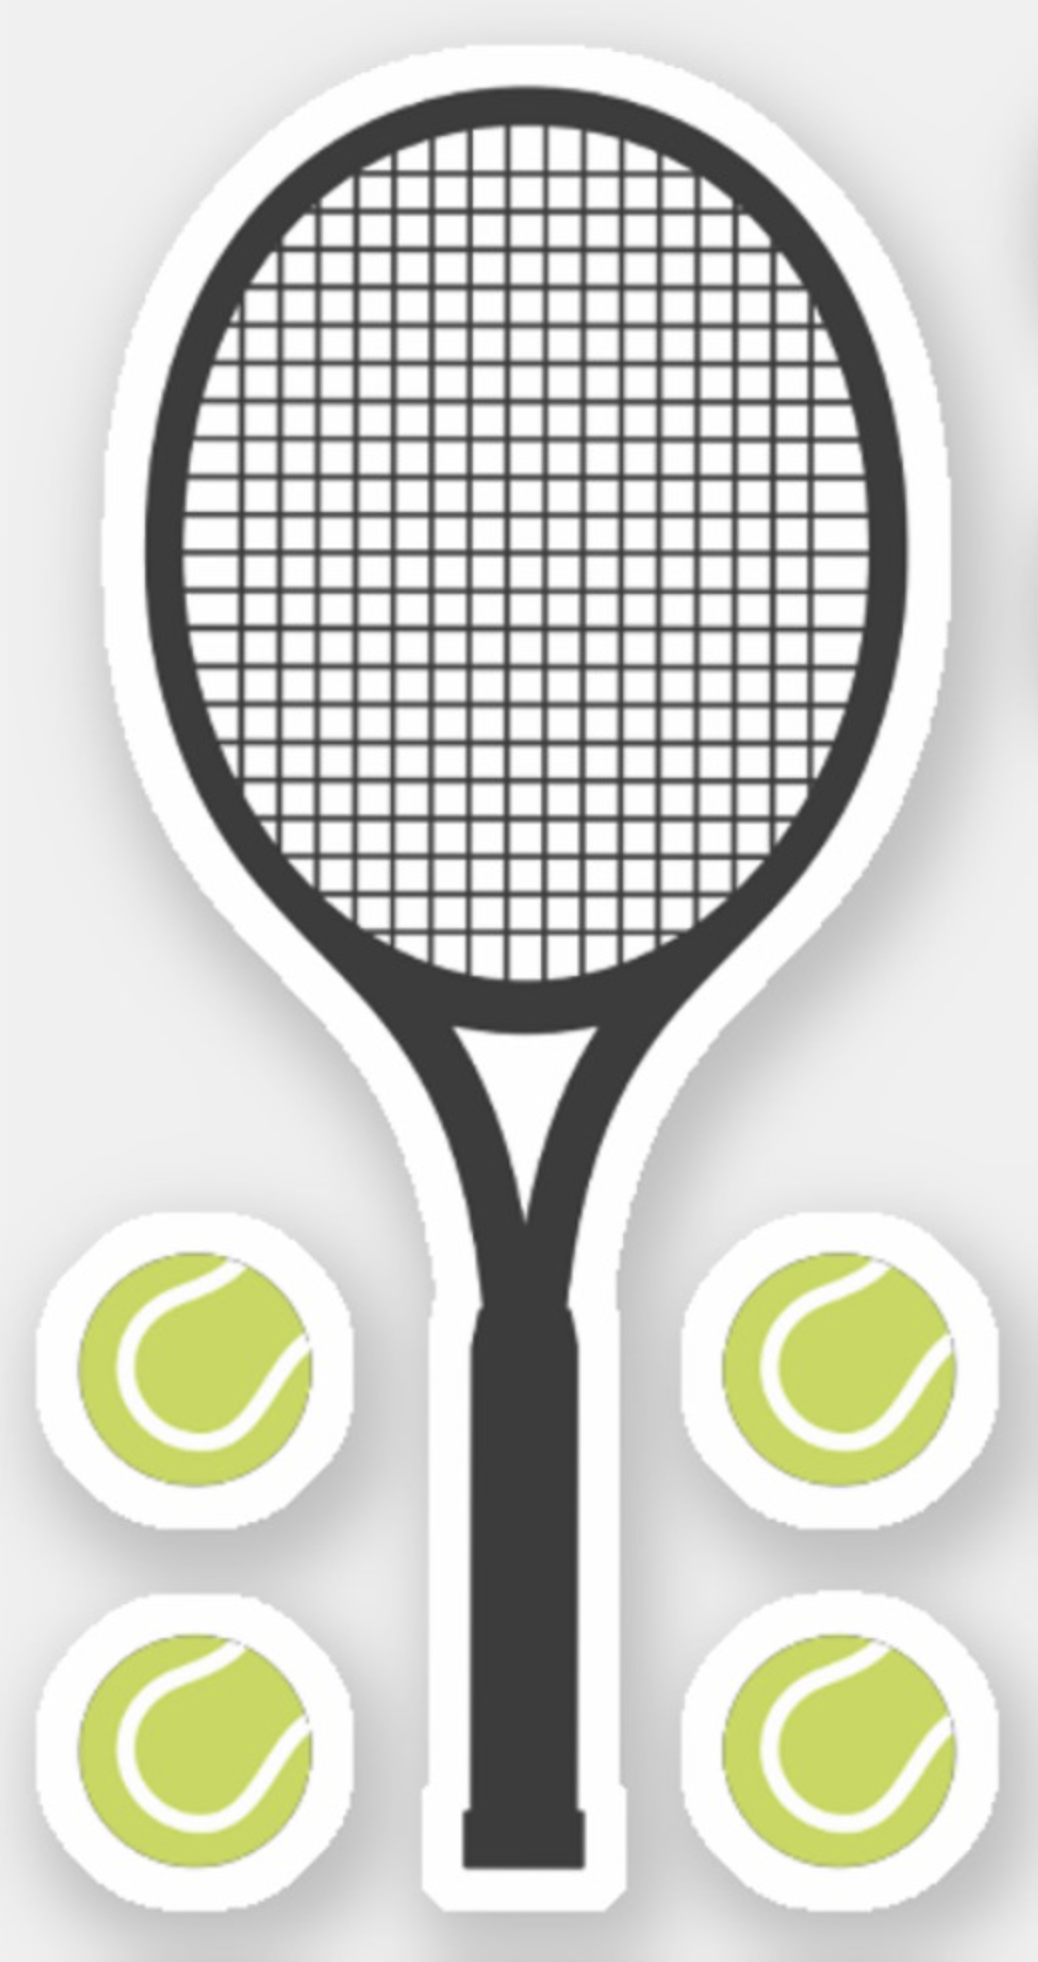 Tennis Balls And Tennis Rackets Sticker Zazzle Com Tennis Racket Tennis Tennis Racket Cake